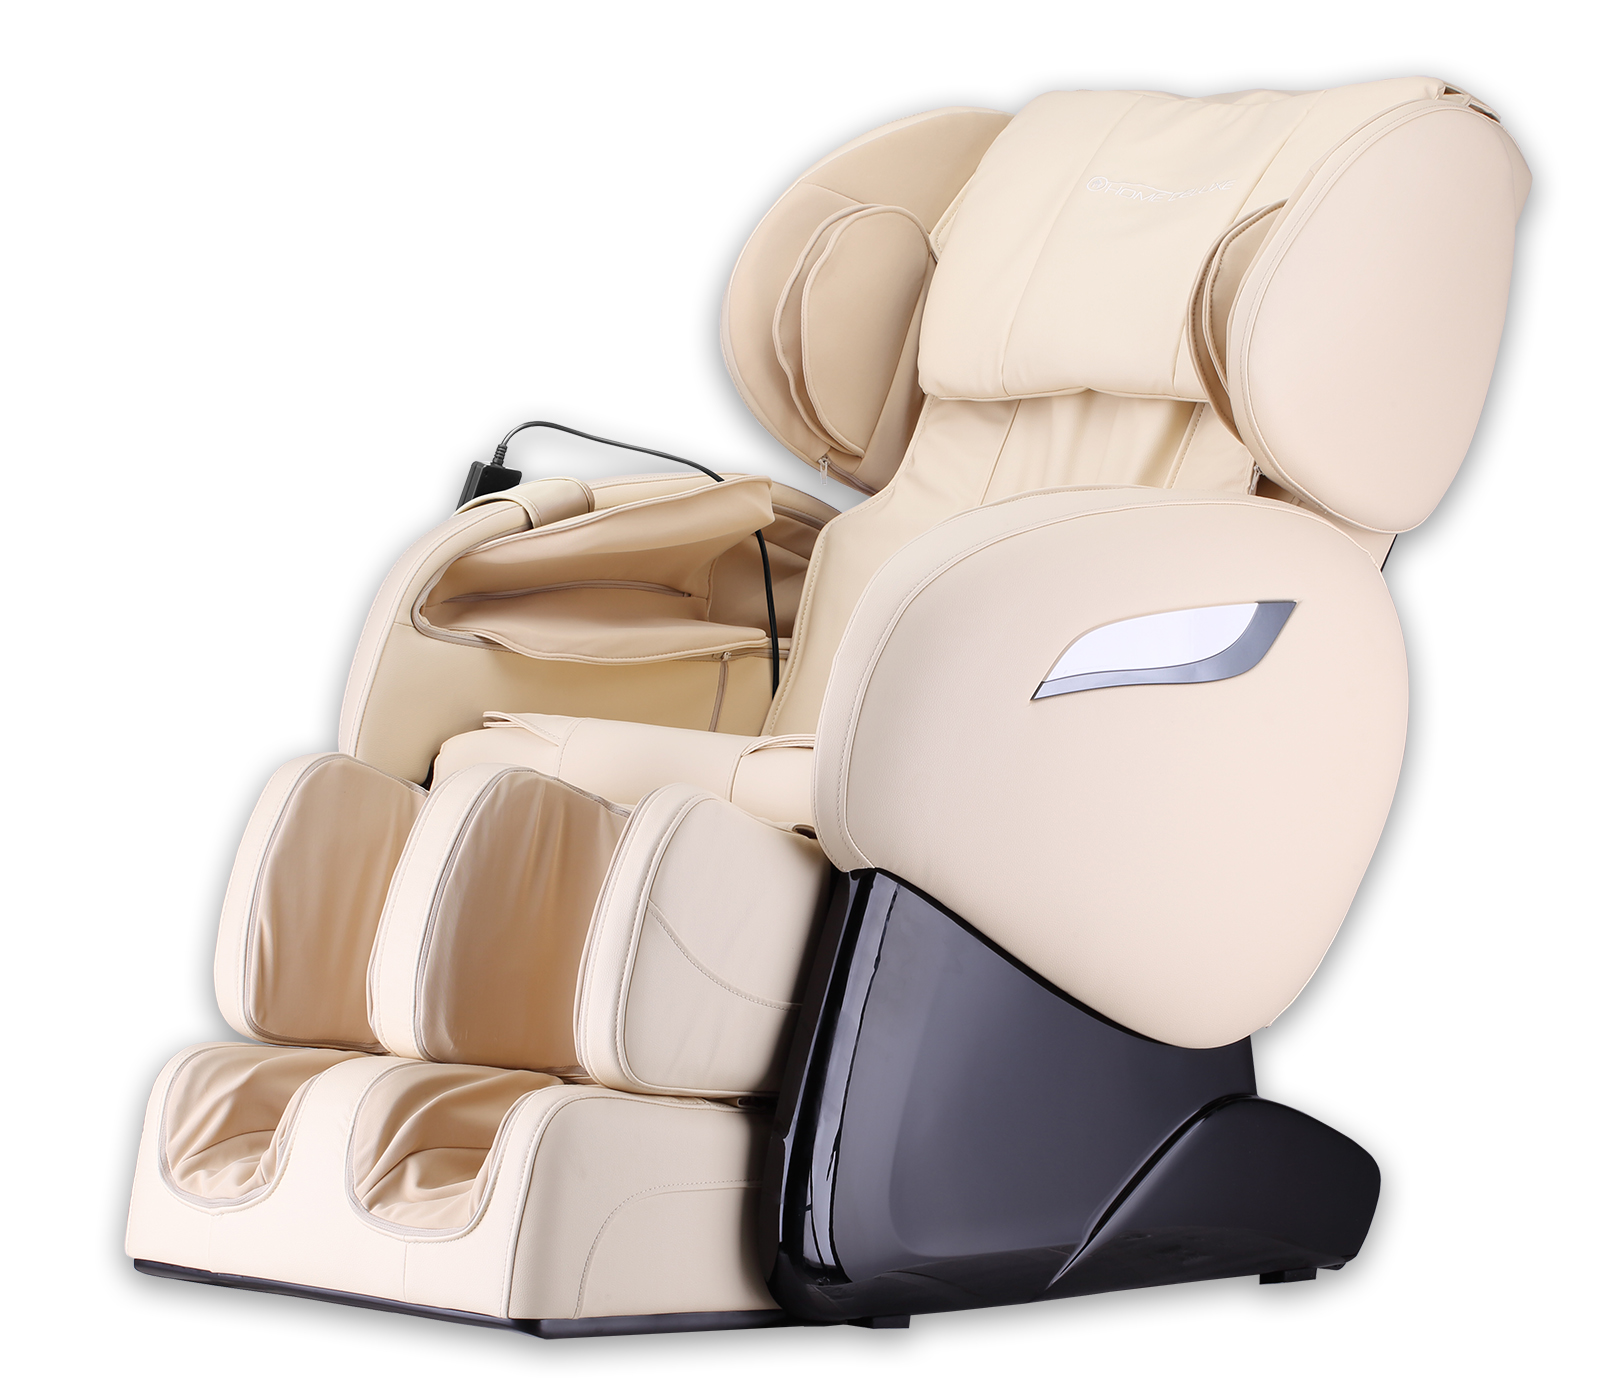 Massagesessel Sueno V2 Beige